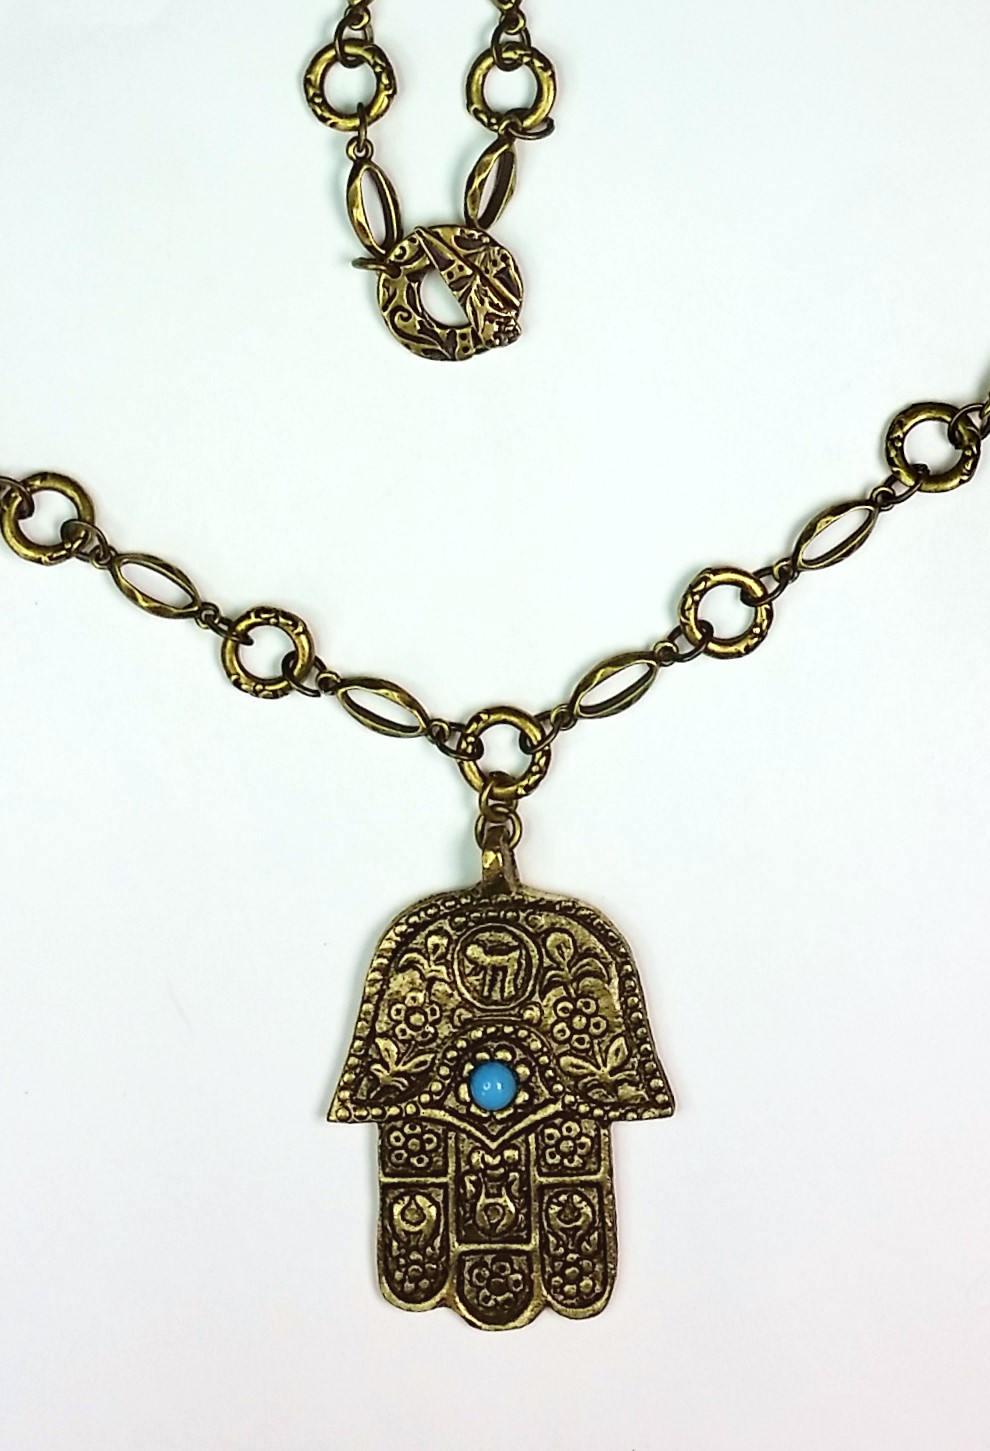 Hamsa pendant talisman long necklace antique brass chain hamsa pendant talisman long necklace antique brass chain blue evil eye judaica middle eastern biocorpaavc